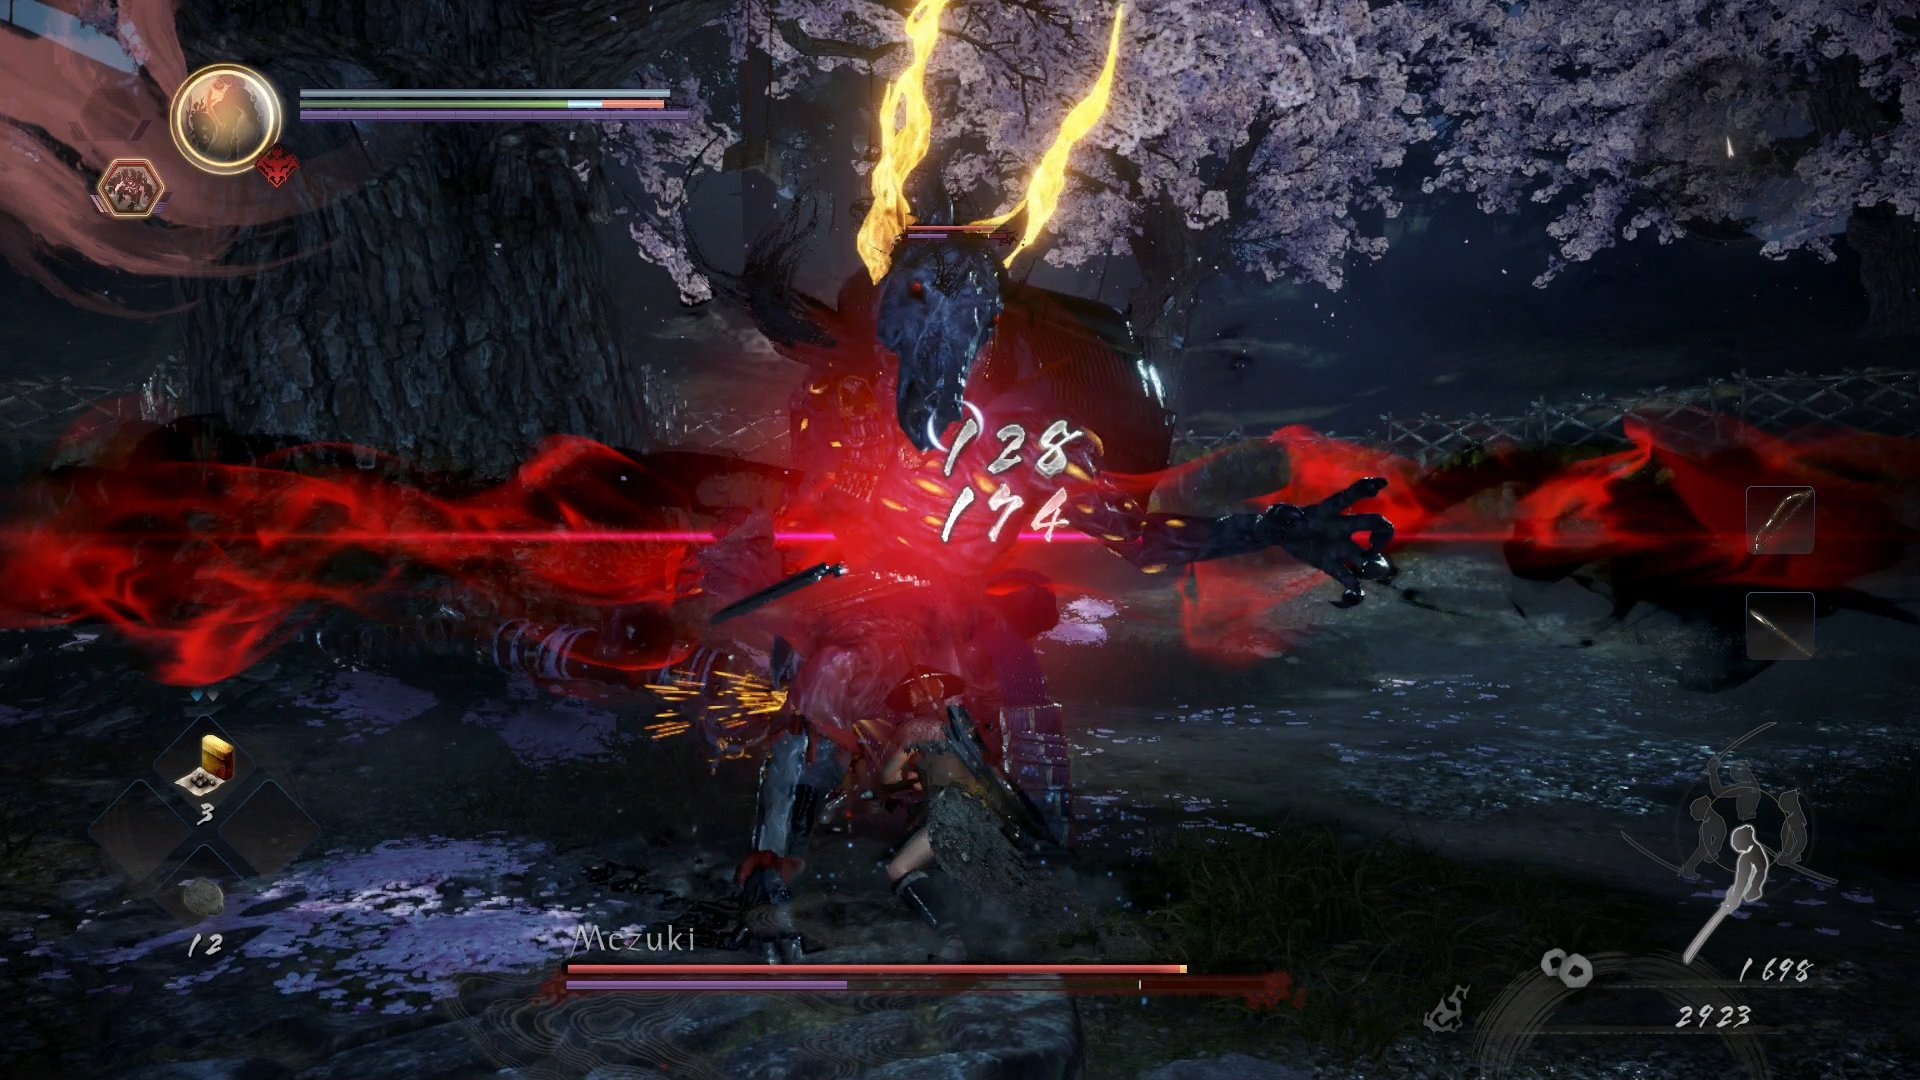 Nioh 2 Mezuki burst counter